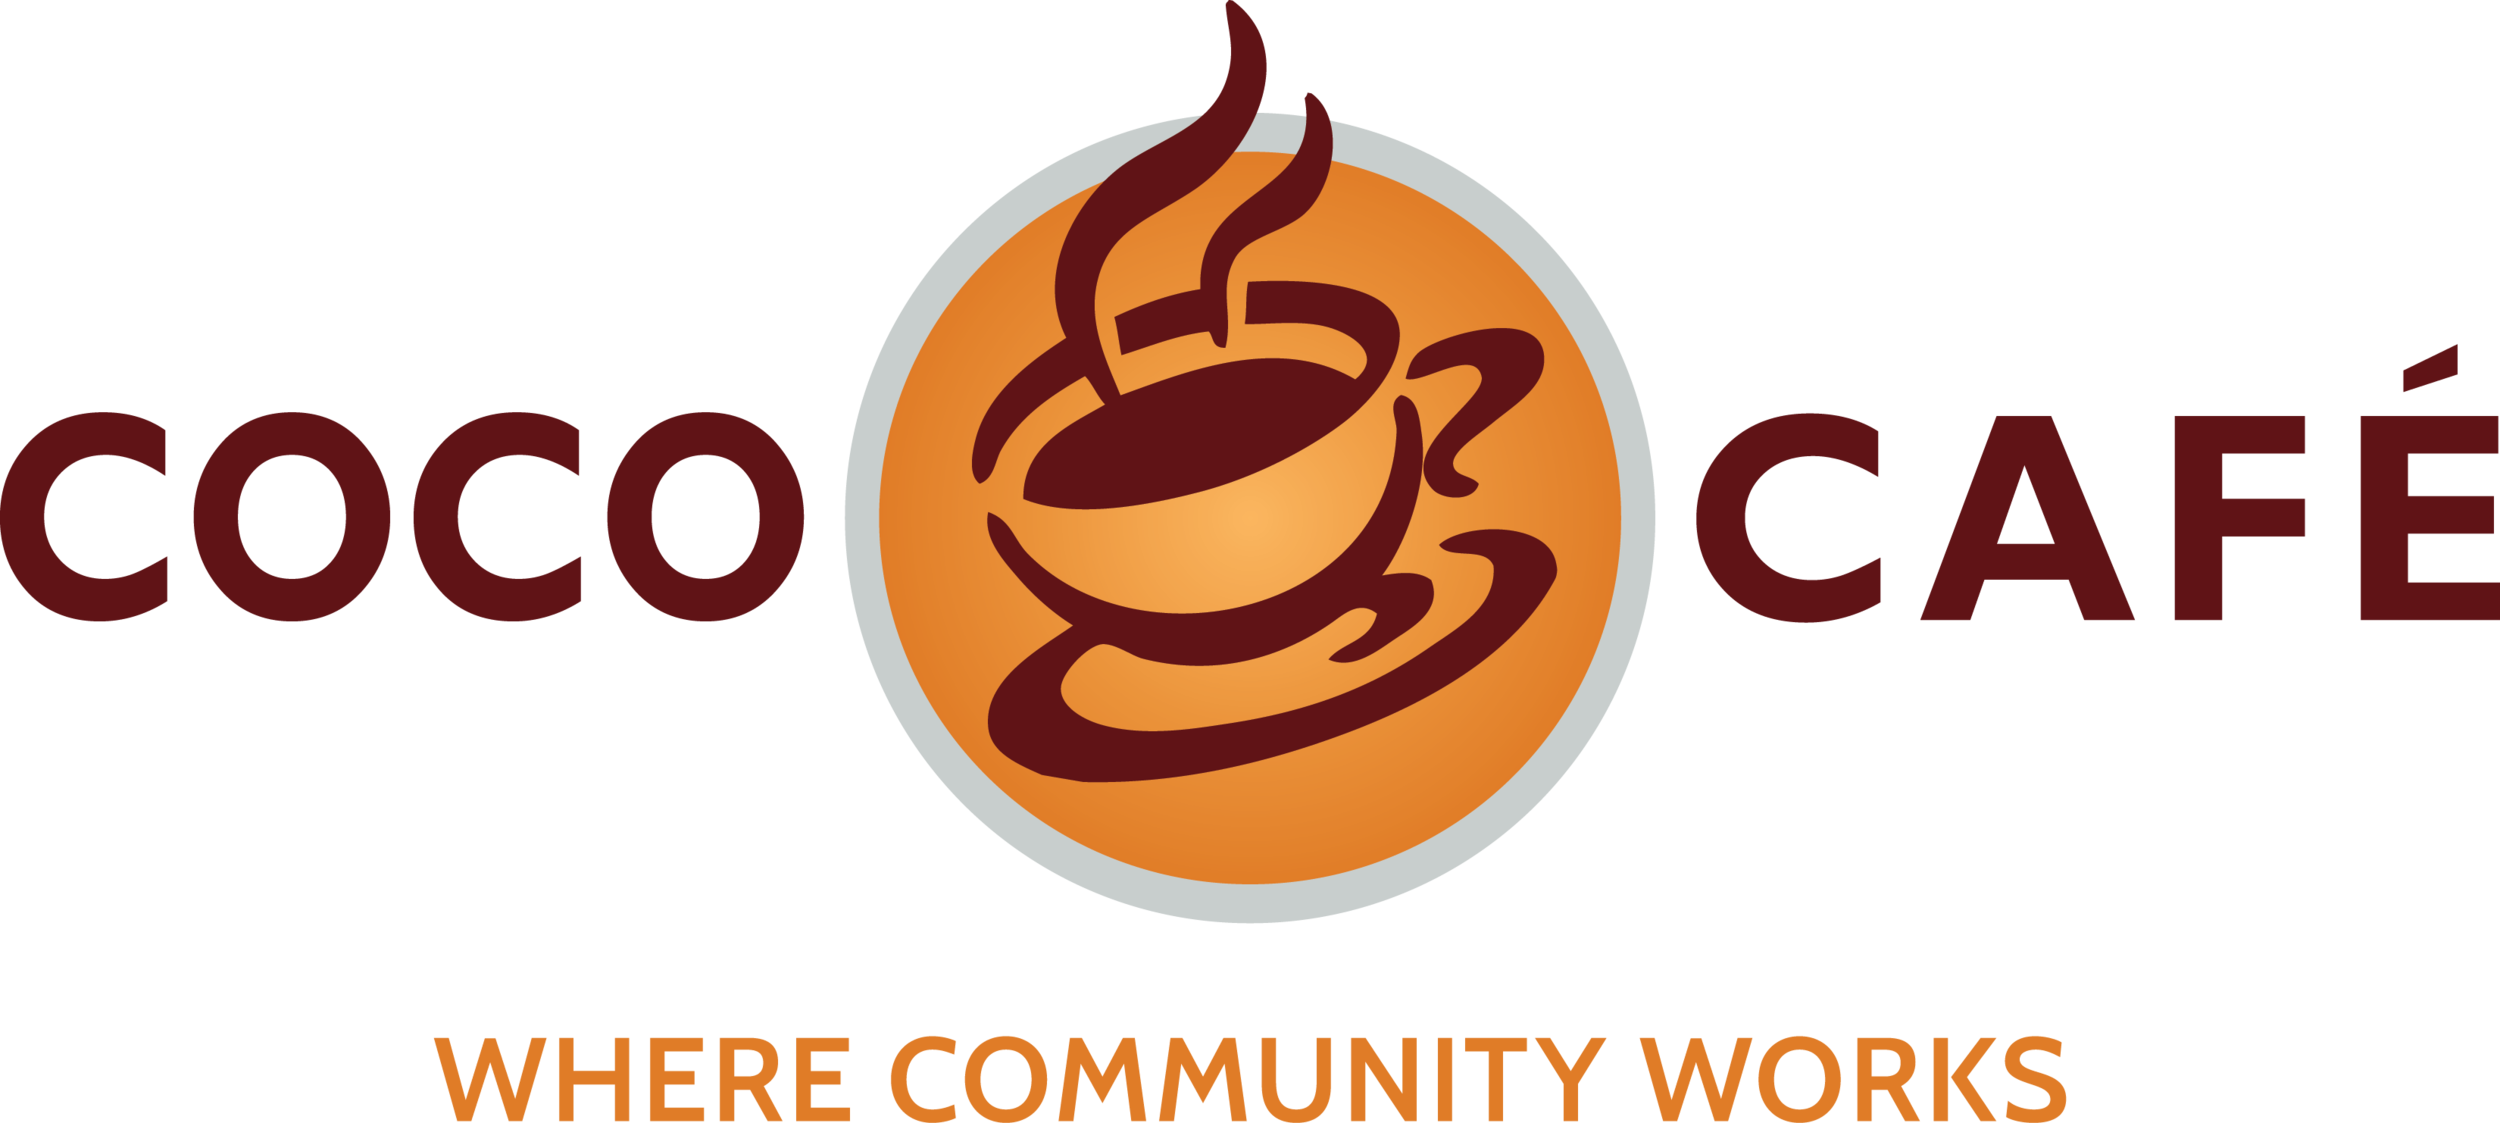 #Wherecommunityworks